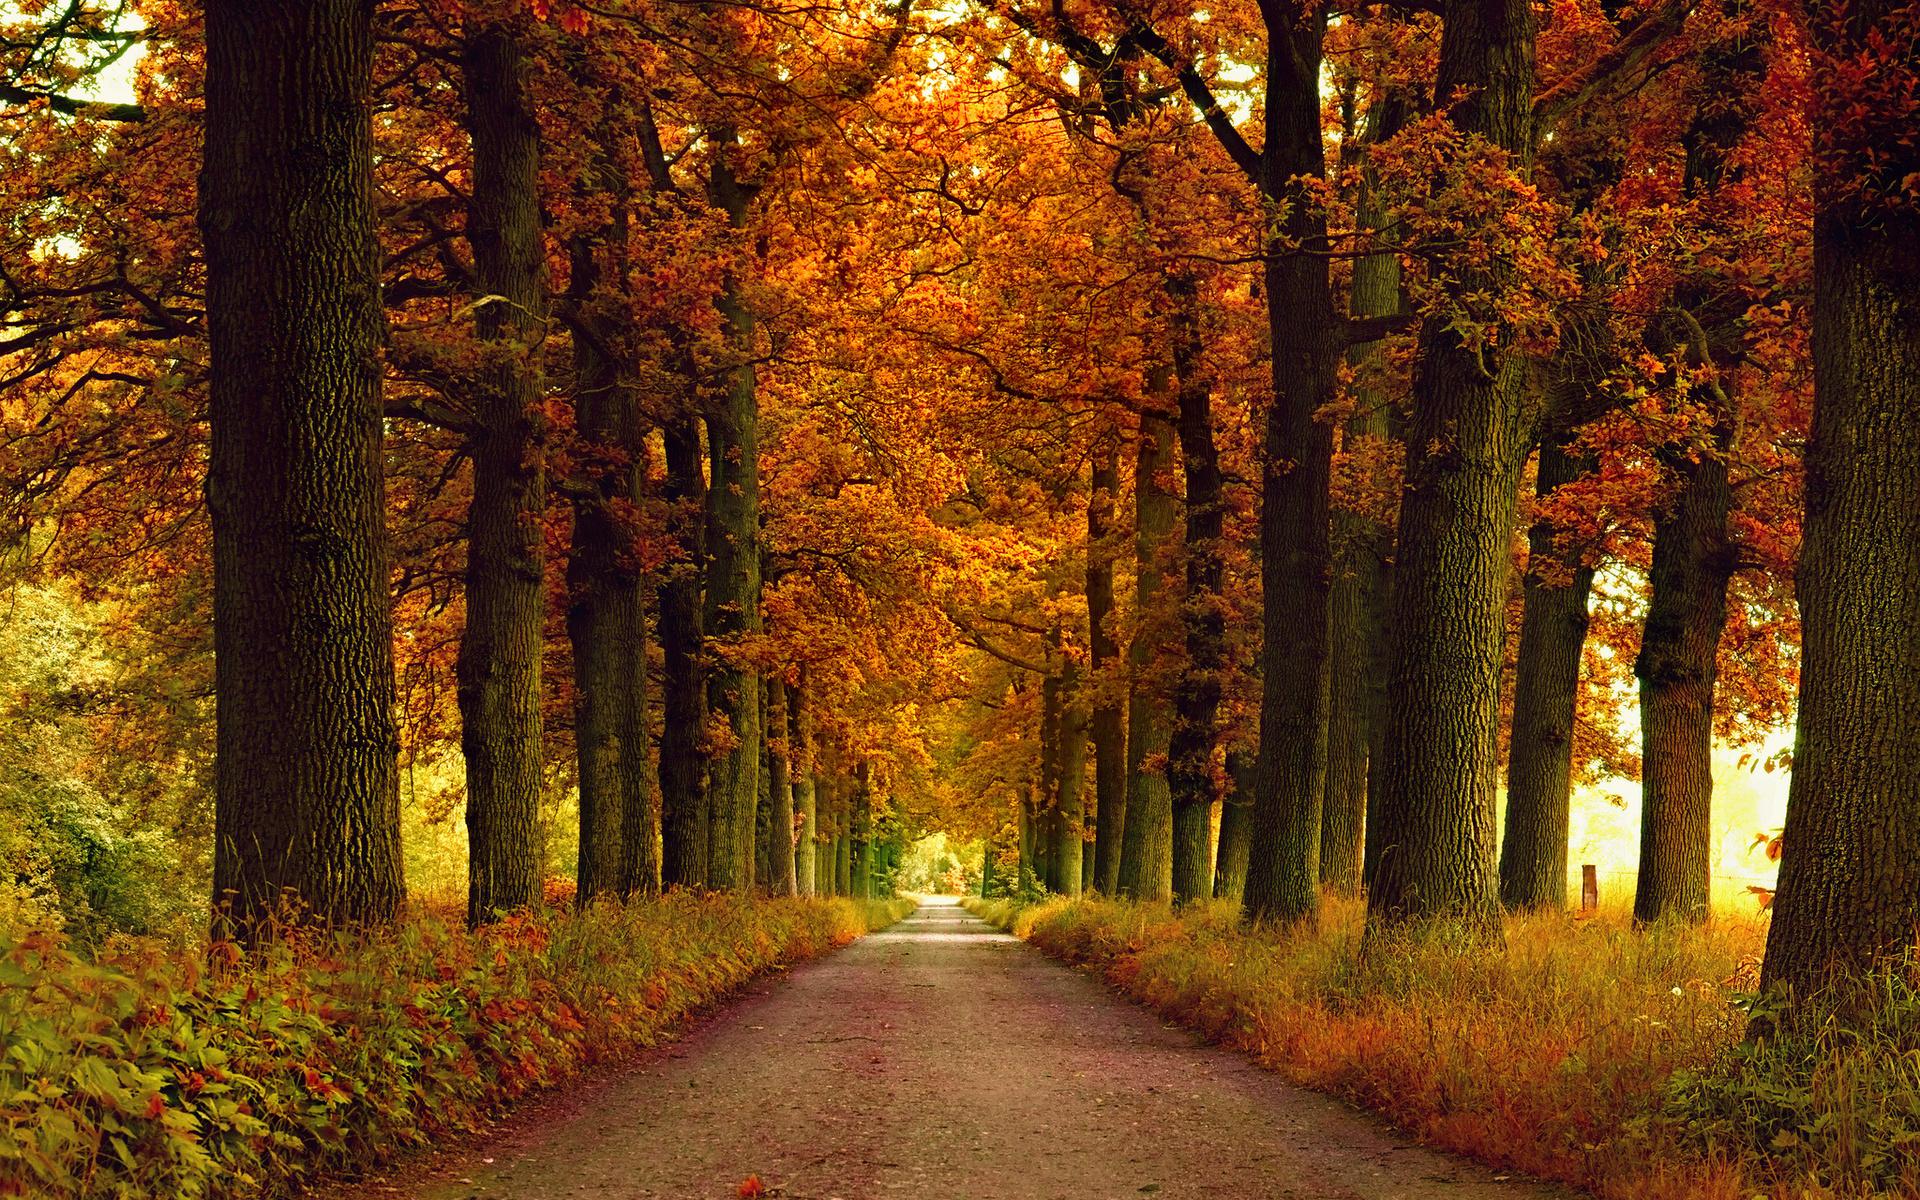 autumn park wallpaper 1920x1080 - photo #30